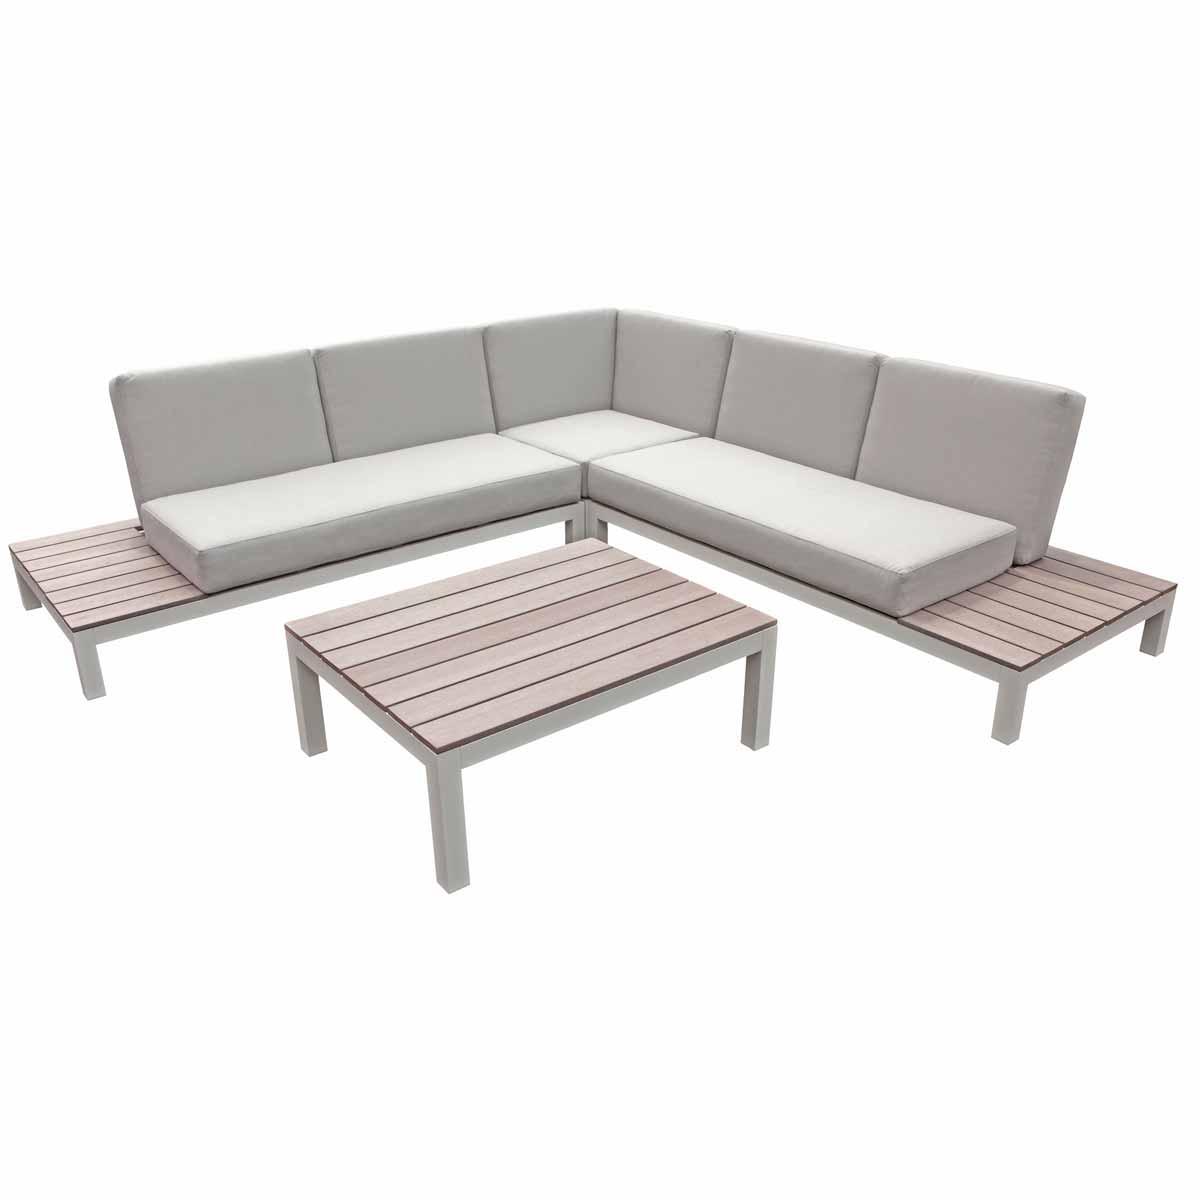 Lounge set 1 x hoekbank + tafel + kussens